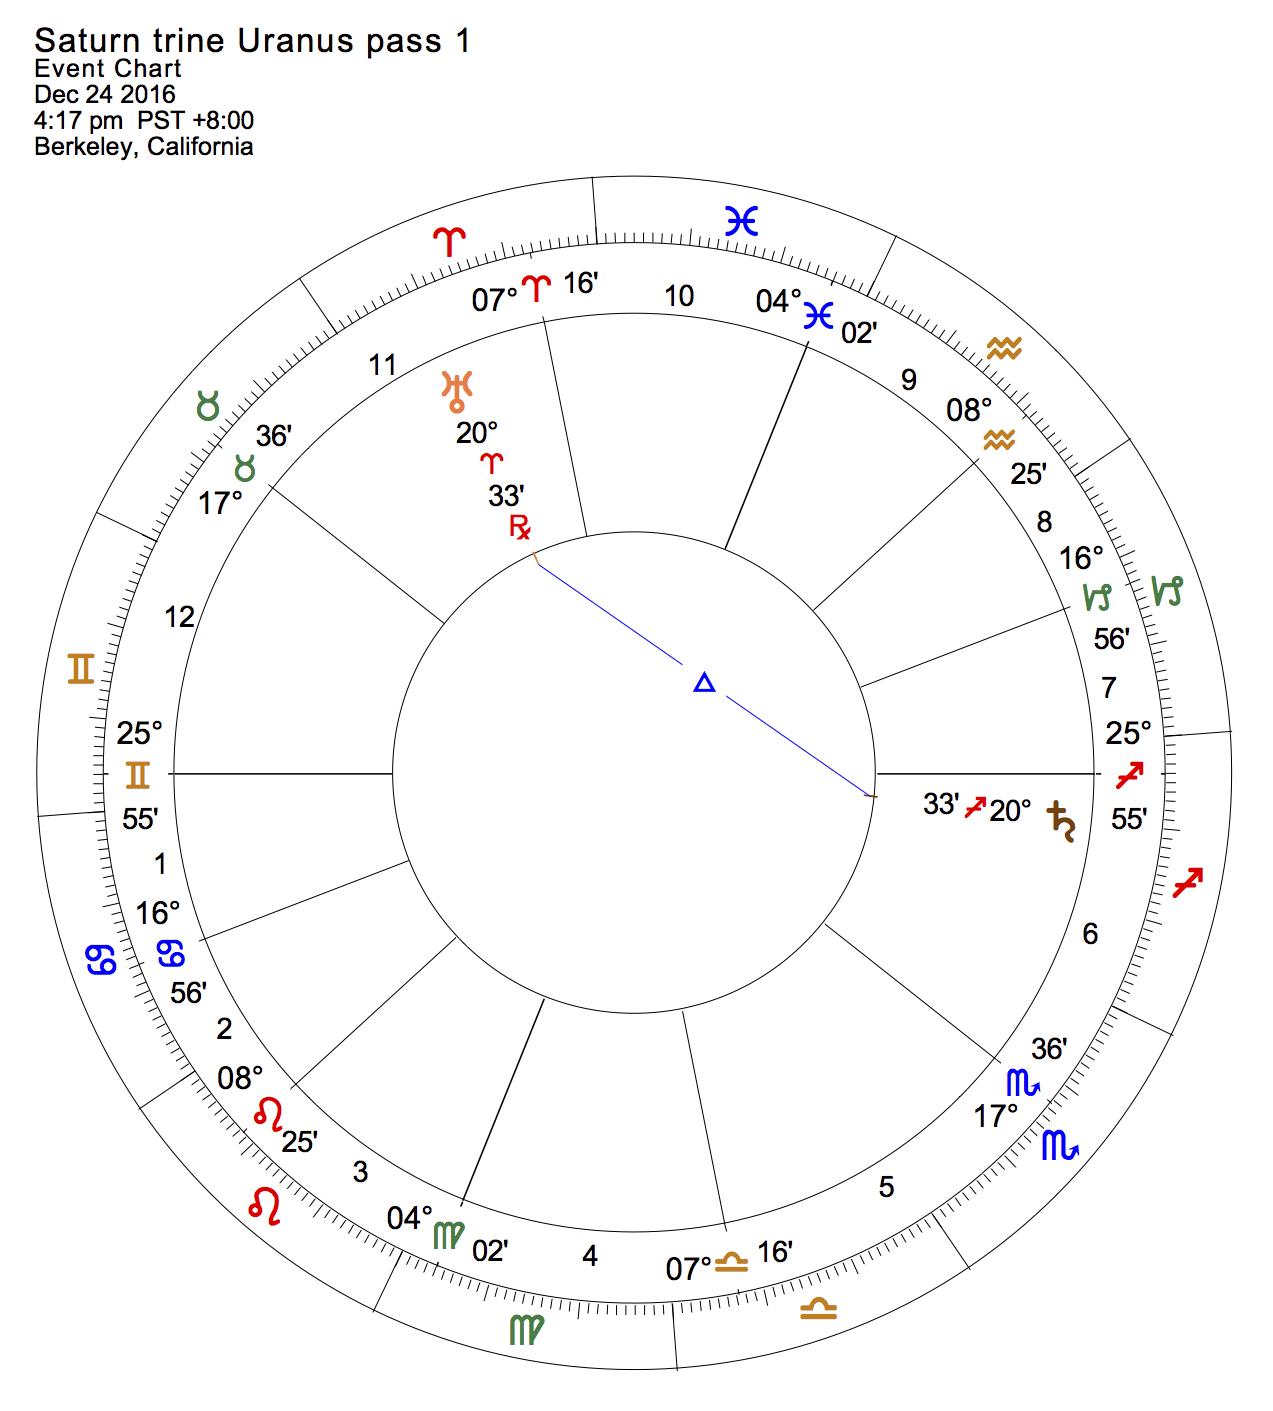 Saturn trine Uranus pass 1